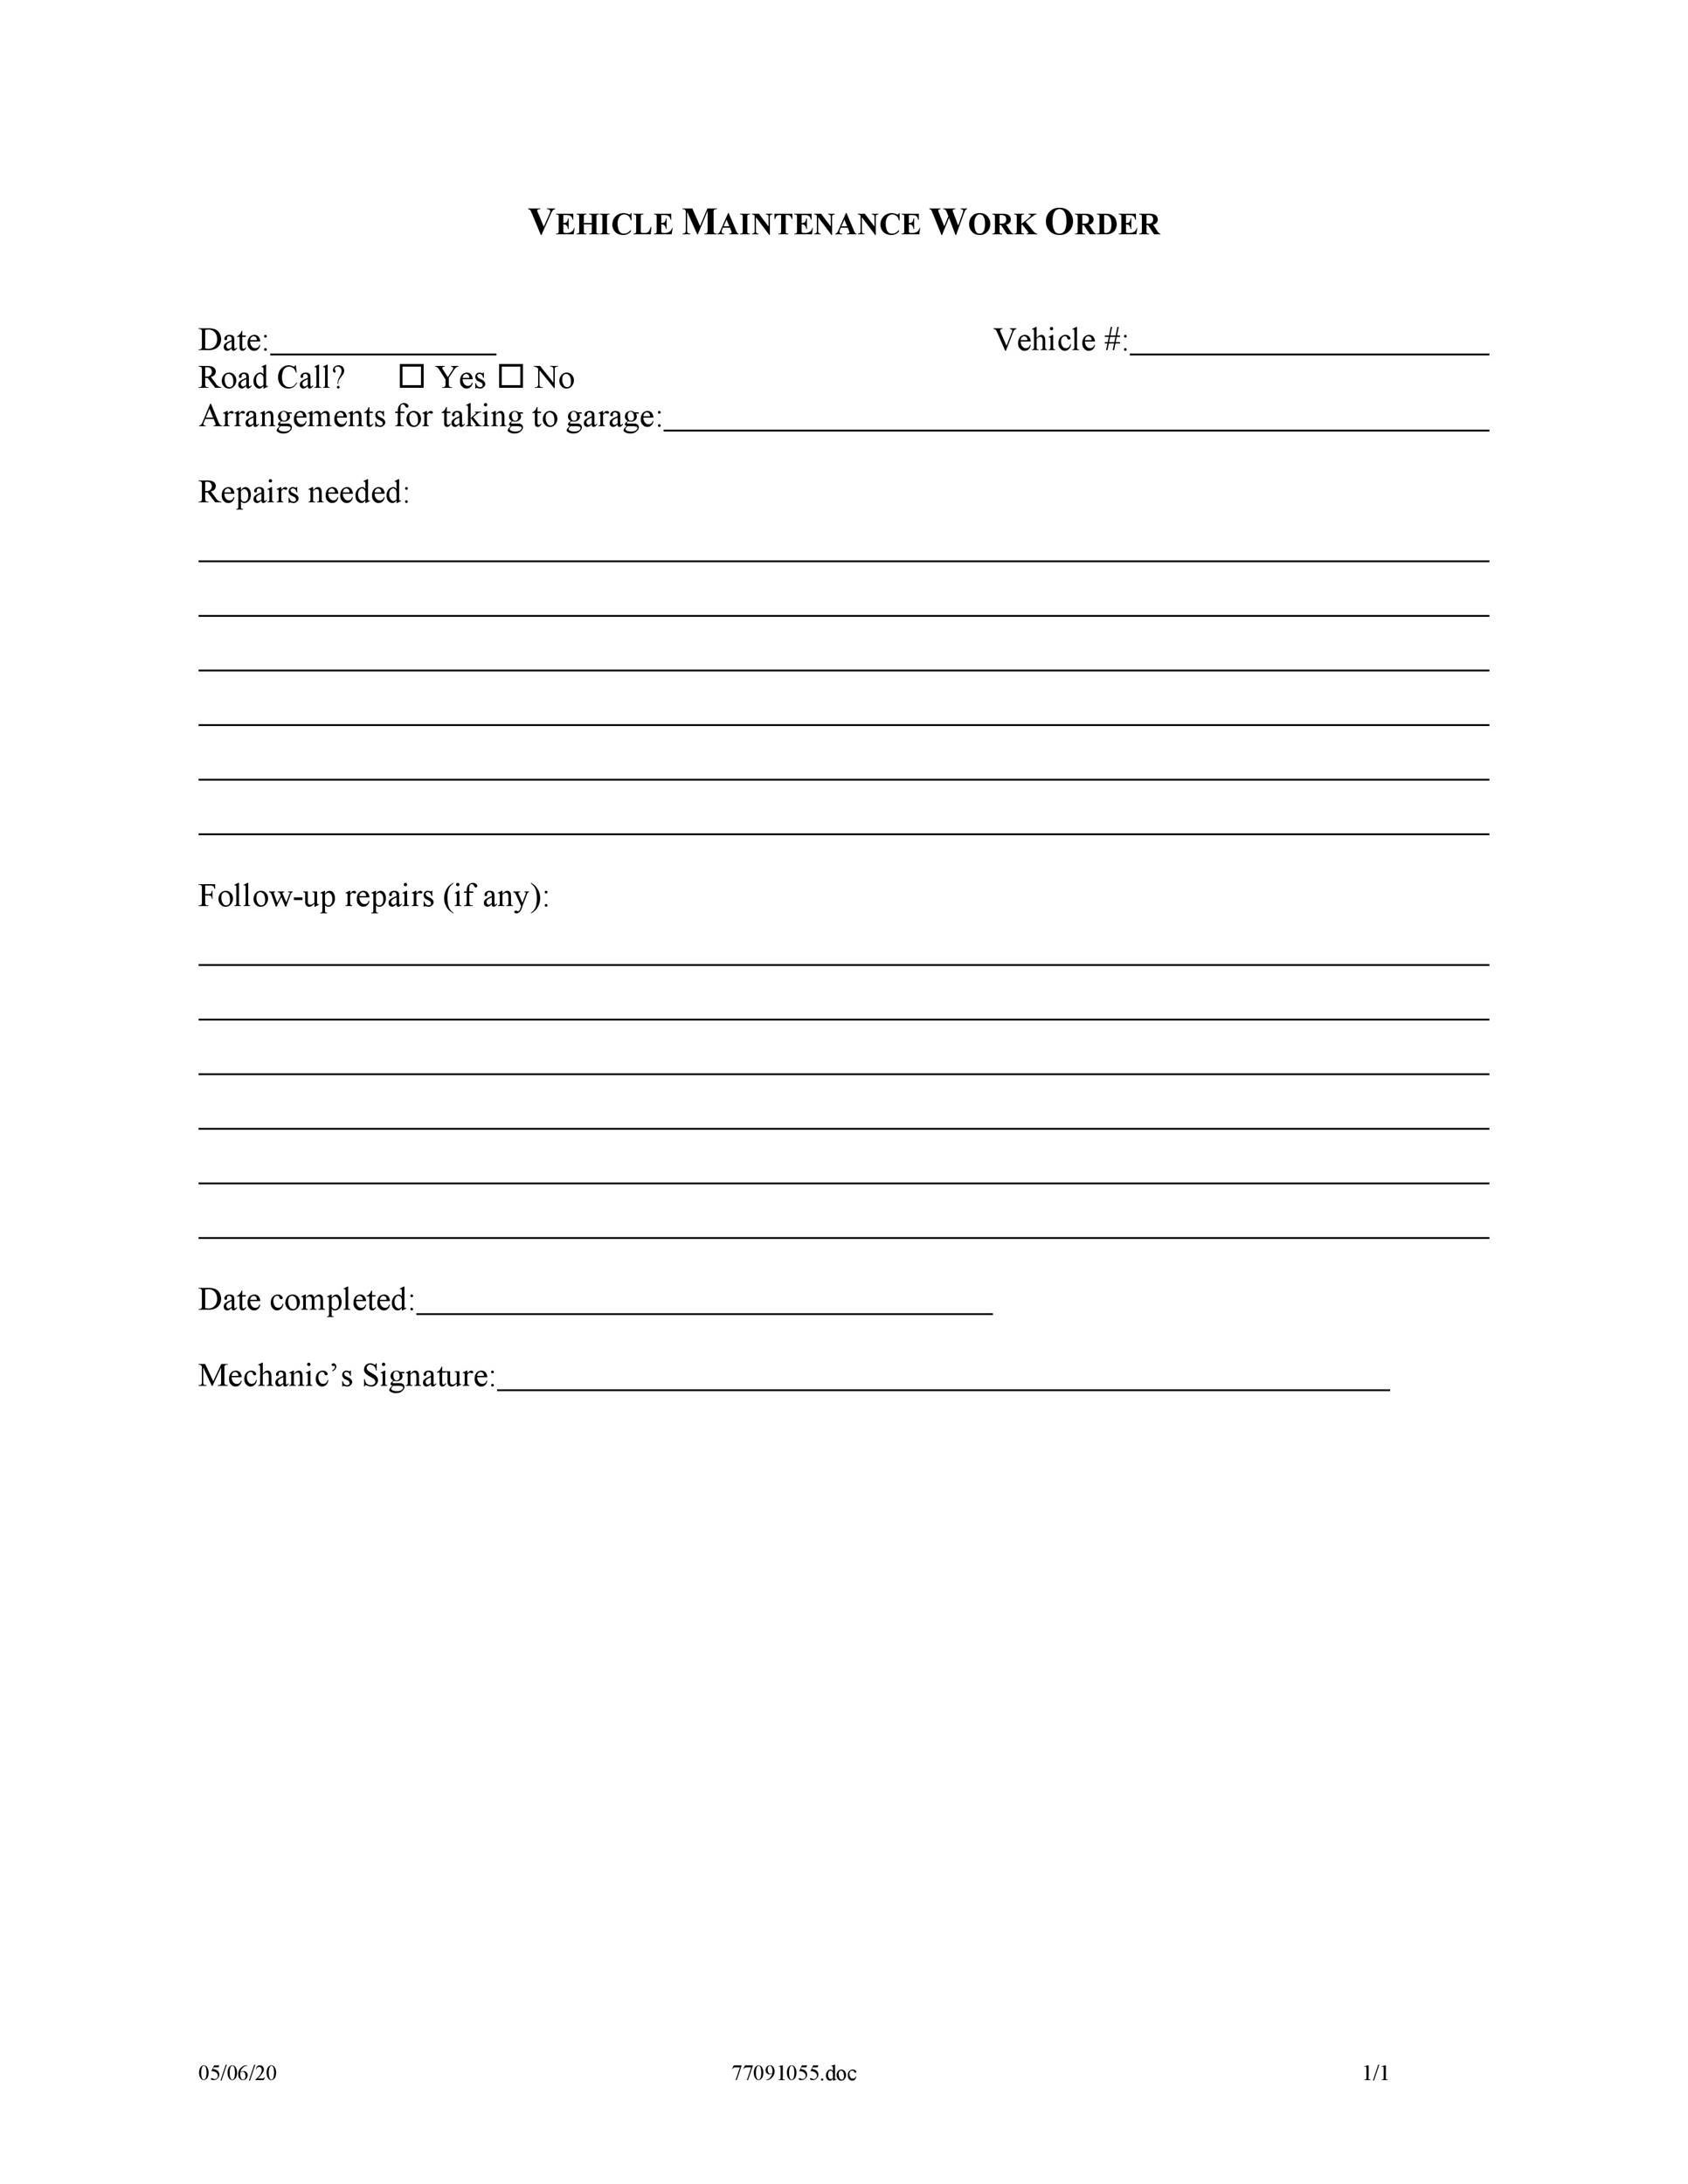 009 Sensational Maintenance Work Order Template Picture  Form Free SampleFull